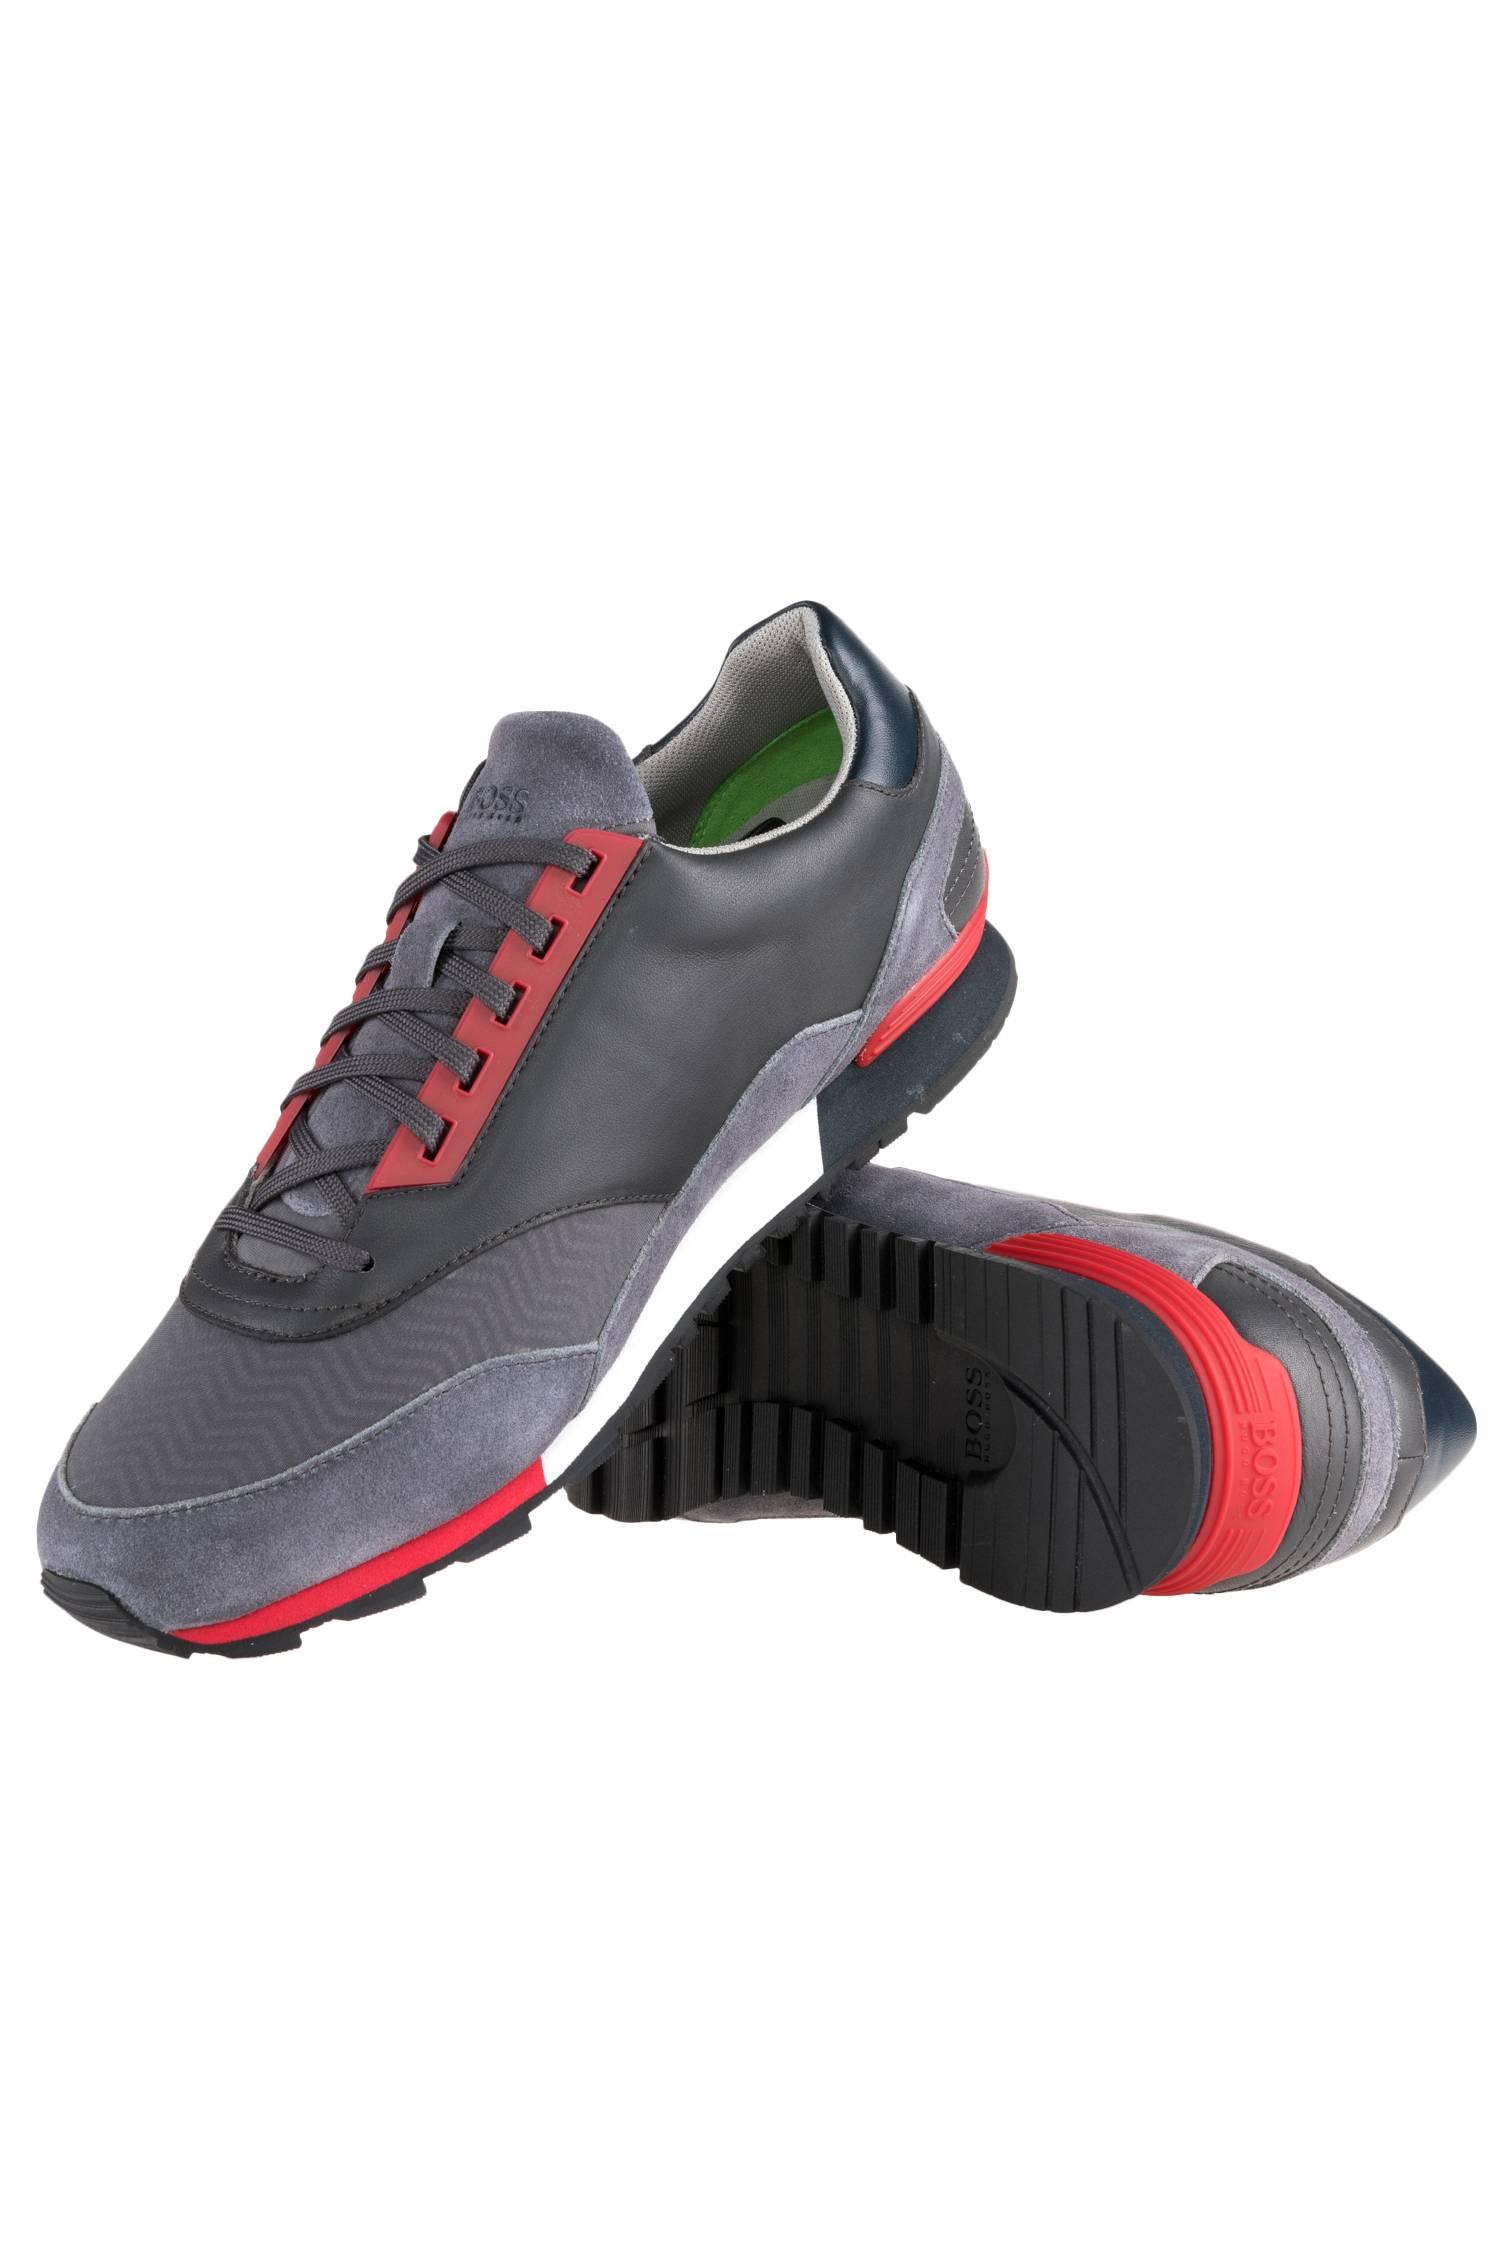 Billig gute Qualität BOSS Green Sneaker Zephir_Runn_track